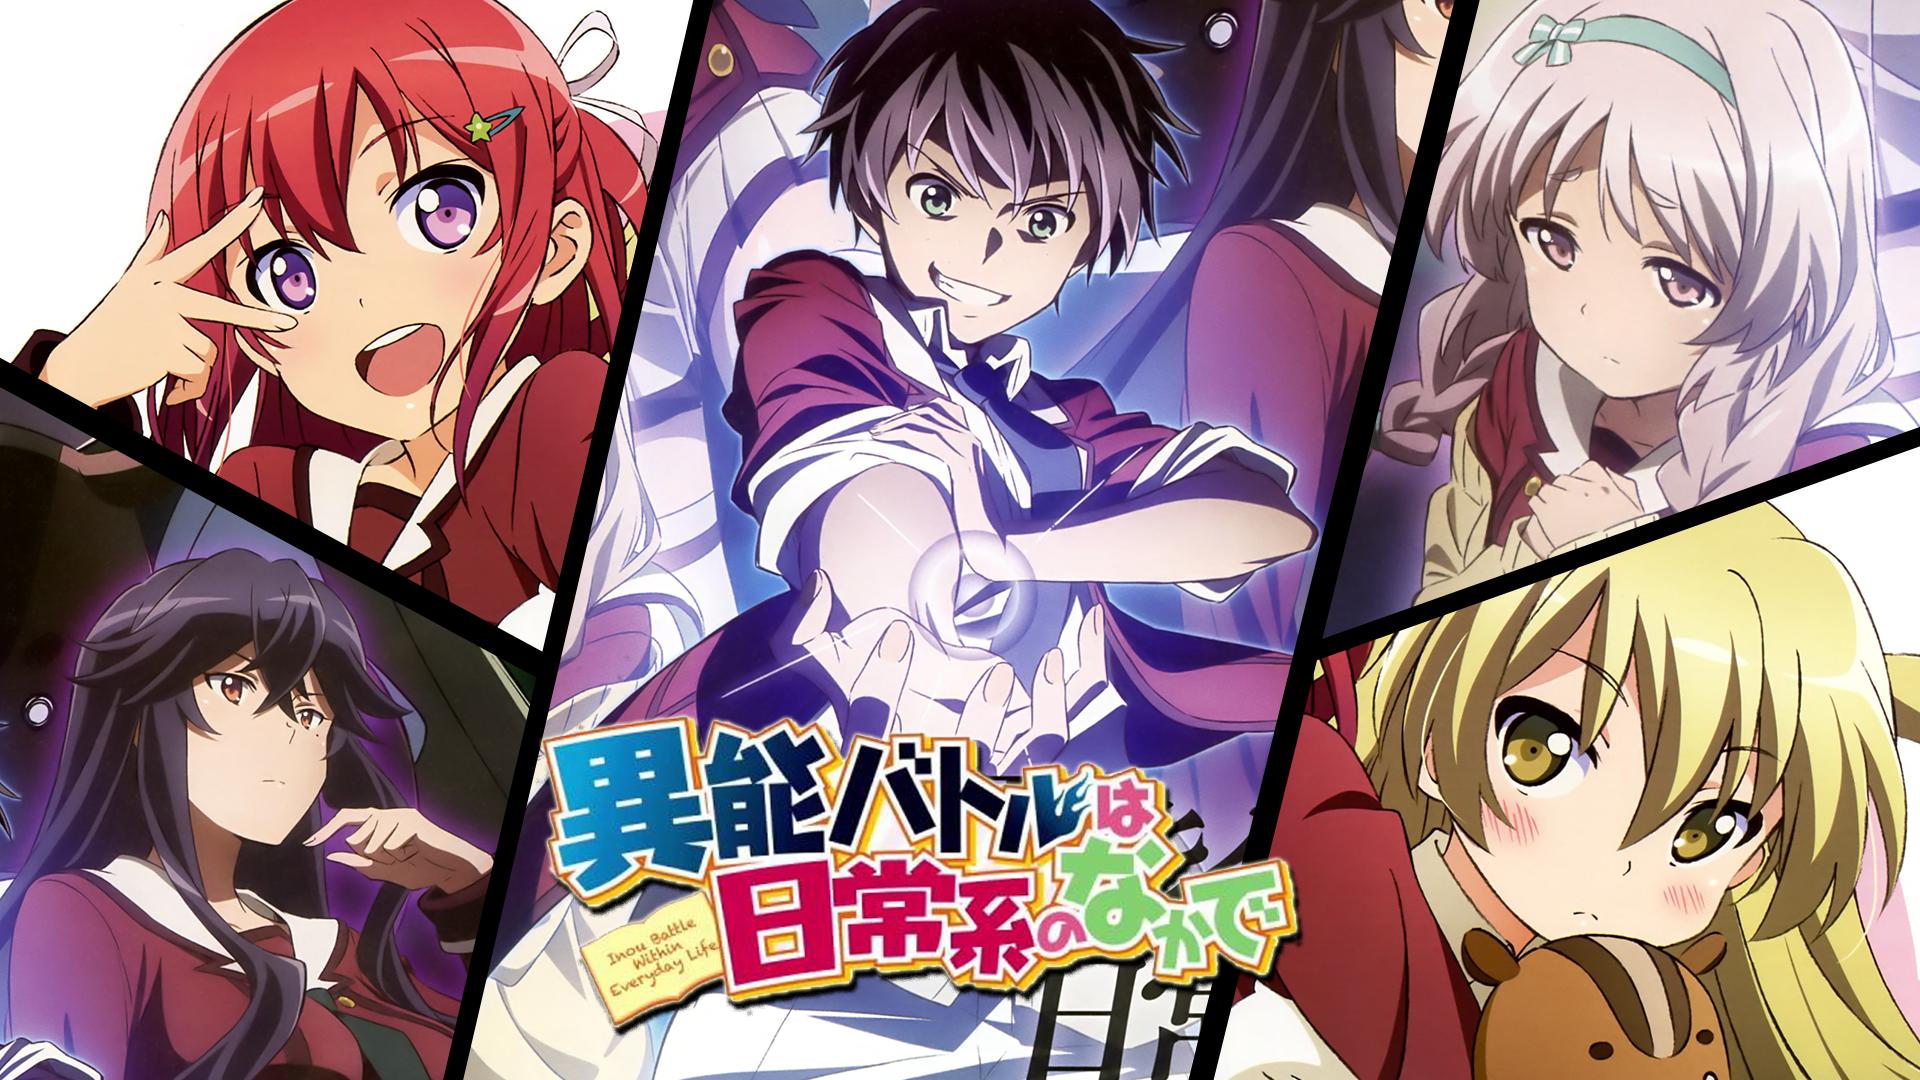 Inou Battle Wa Nichijou Kei No Naka De Daniel S Blog